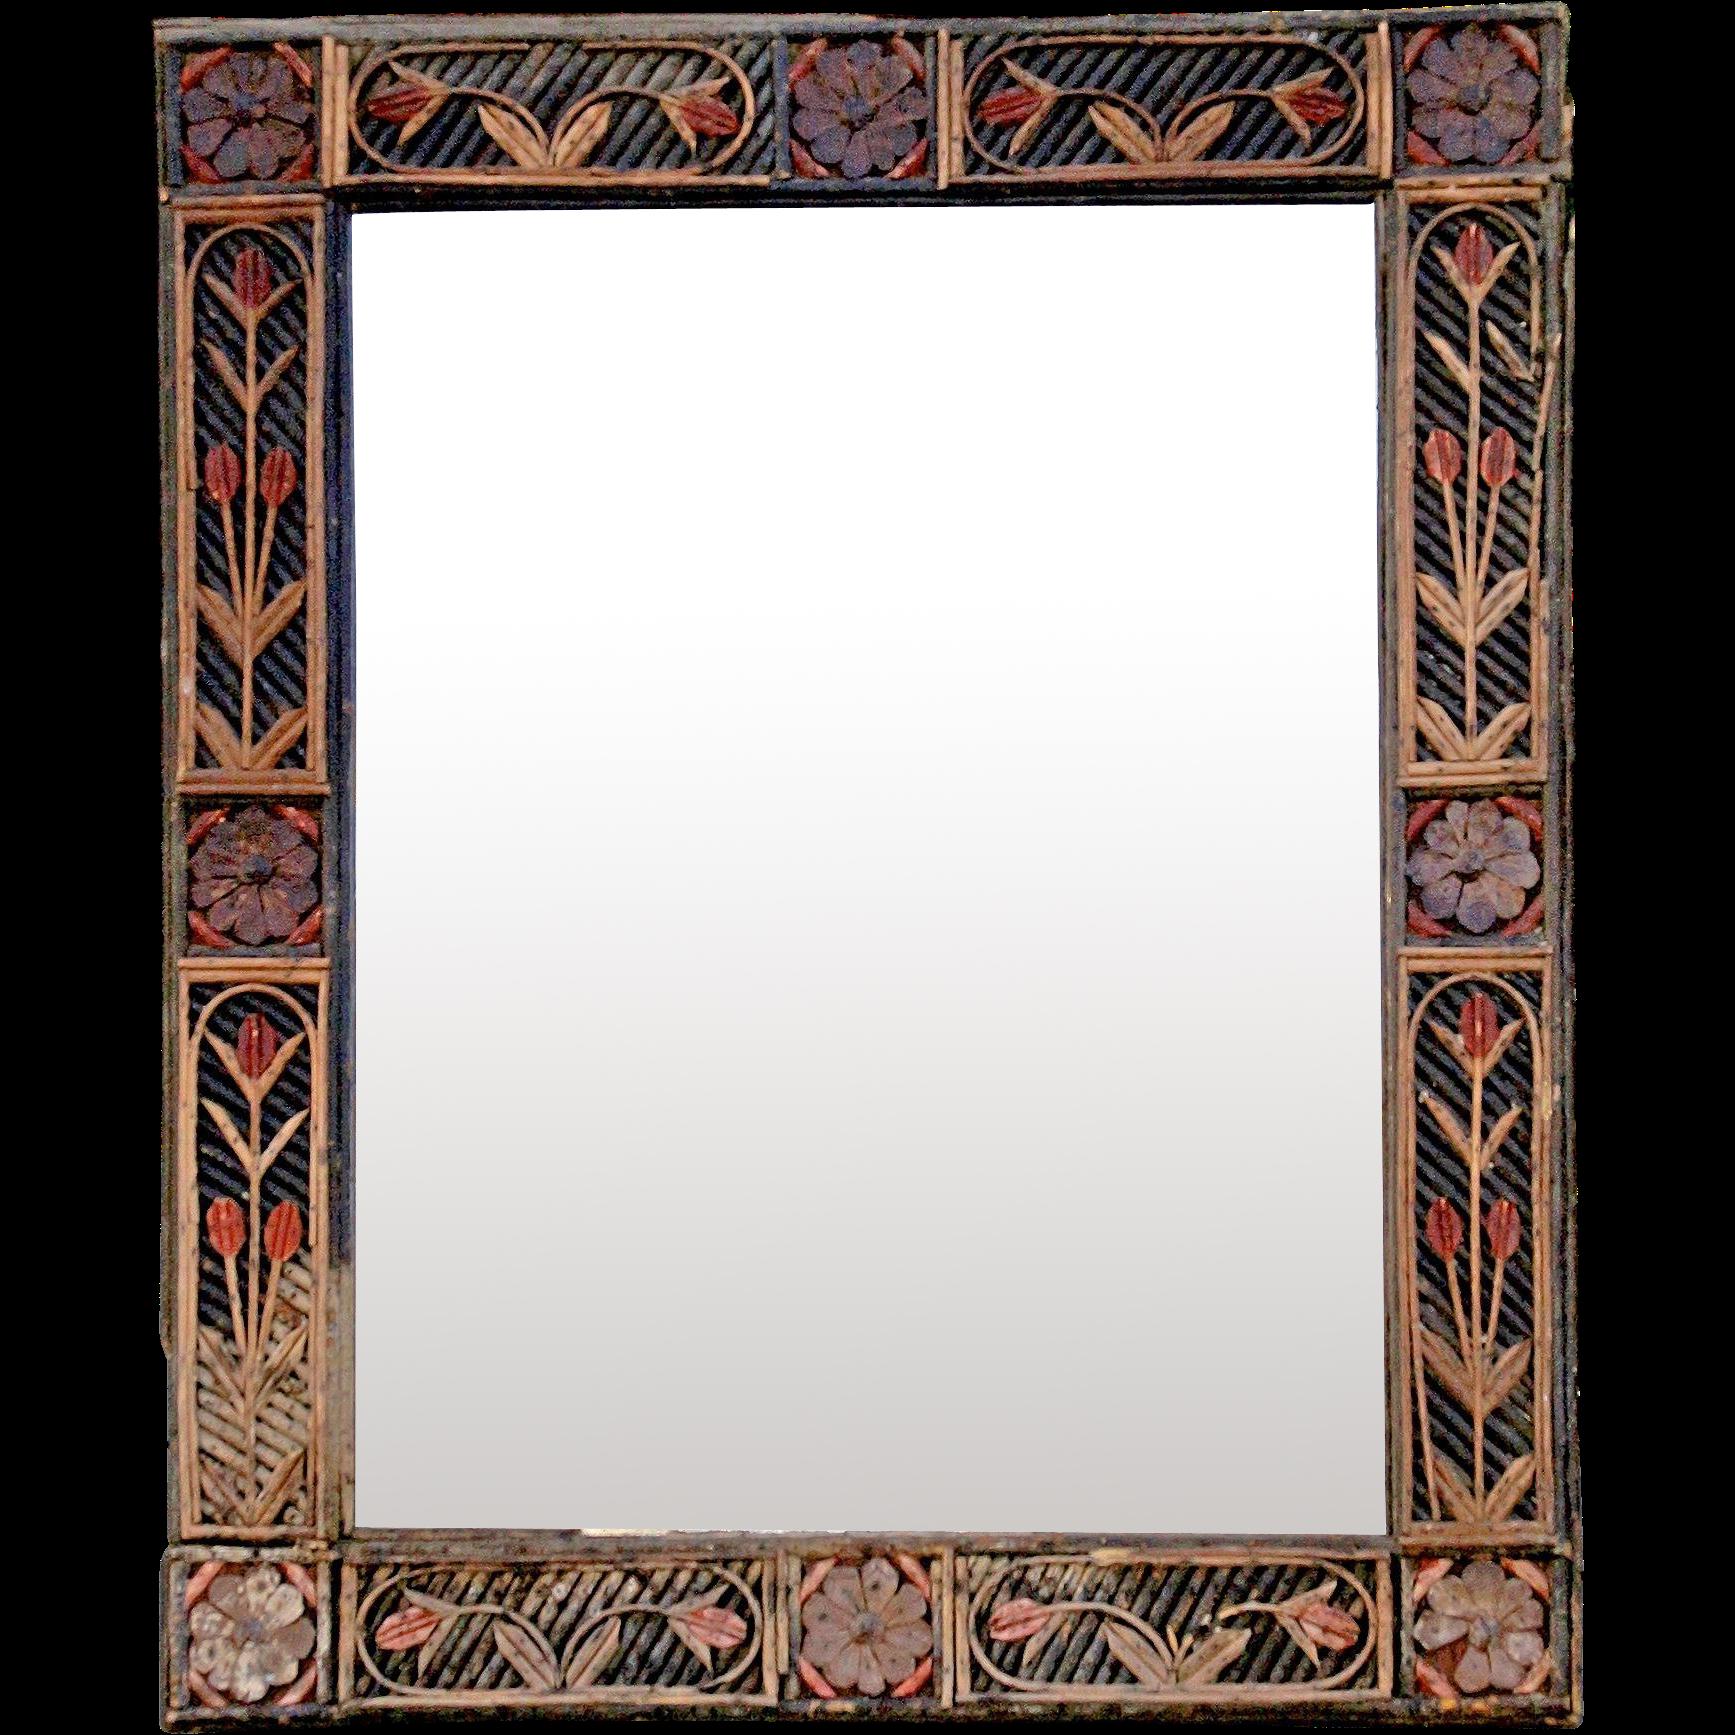 'Tramp Art' Framed Mirror from France